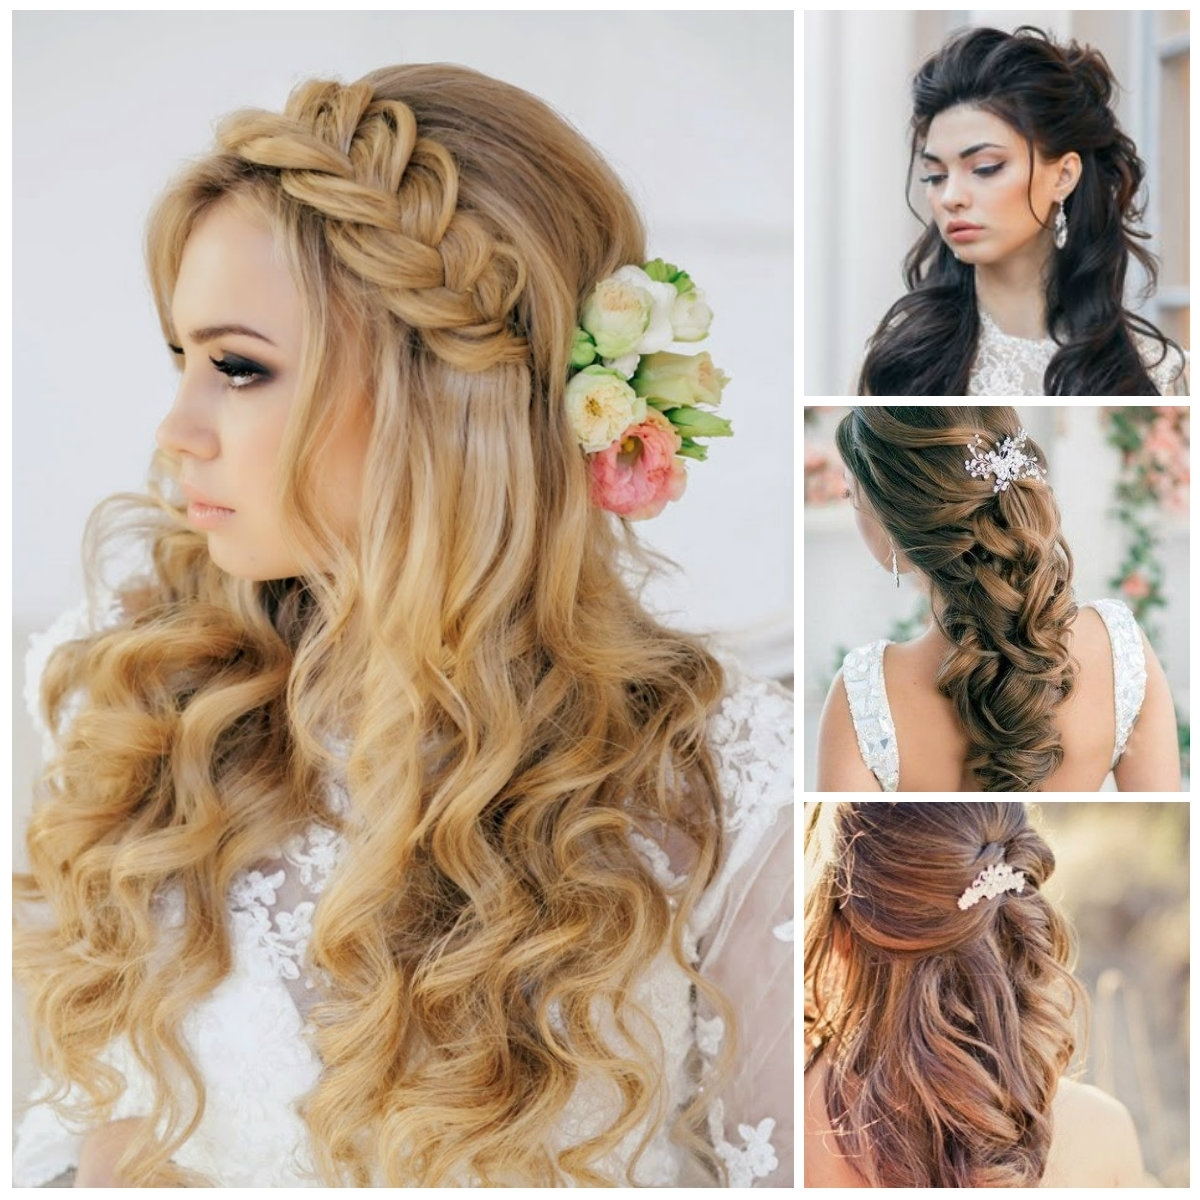 Wedding Half Half Hairstyles For 2018 – 2019 – Best Hairstyles Ideas Inside 2018 Wedding Hairstyles For Short Length Hair Down (View 5 of 15)